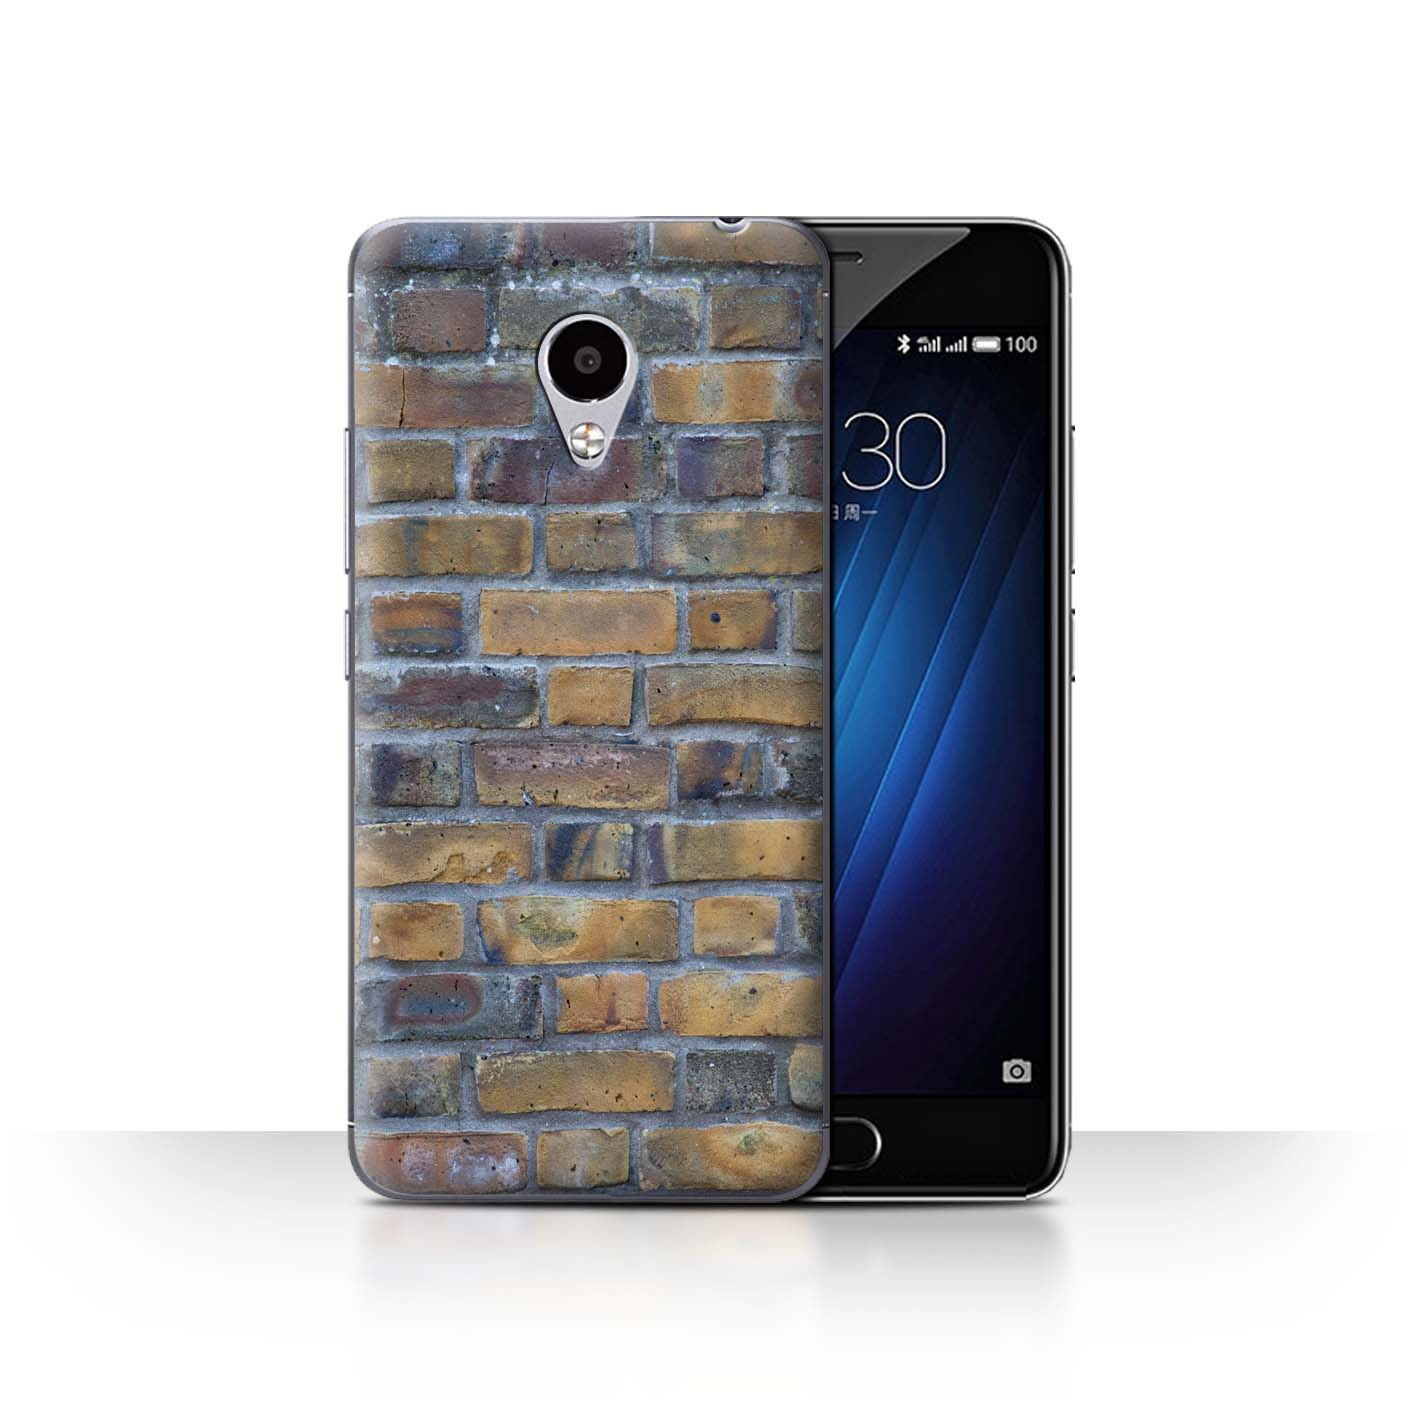 STUFF4-Back-Case-Cover-Skin-for-Meizu-M3S-Brickwork